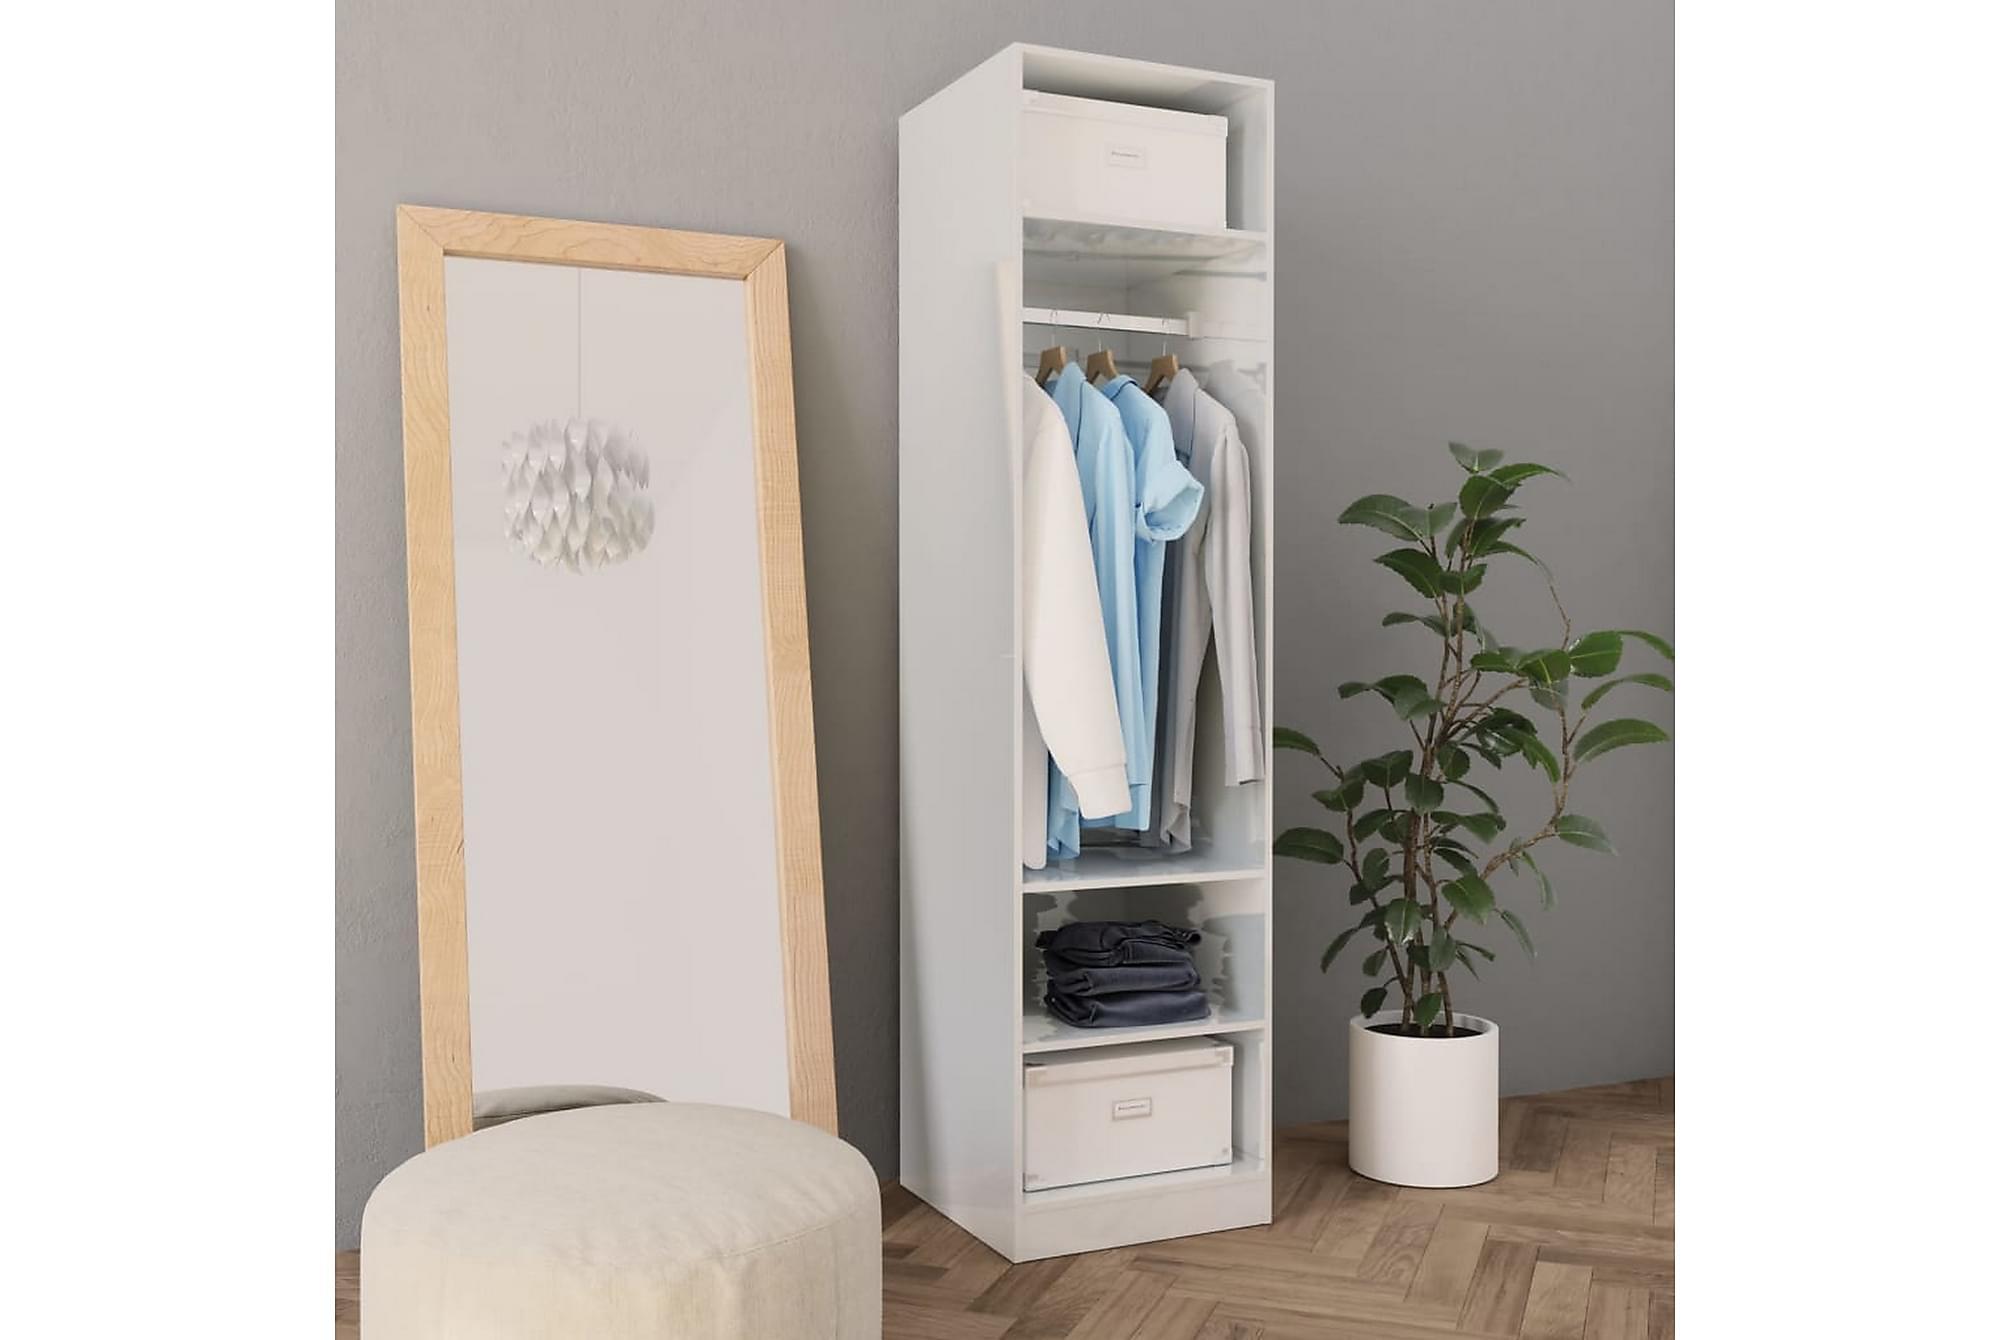 Garderob högglans vit 50x50x200 cm spånskiva